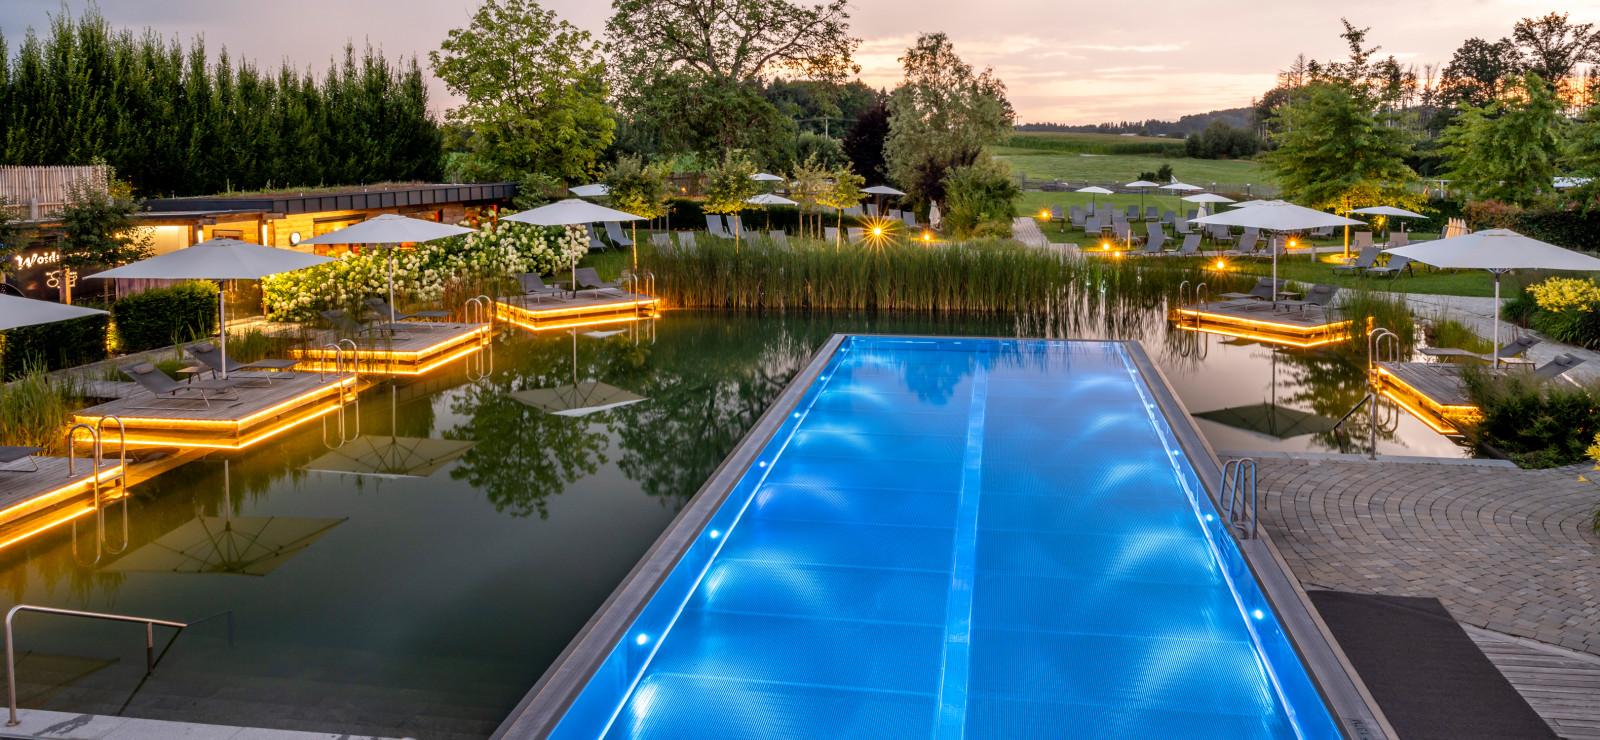 wellnesshotels bad birnbach bayern bewertungen f r wellness hotels. Black Bedroom Furniture Sets. Home Design Ideas